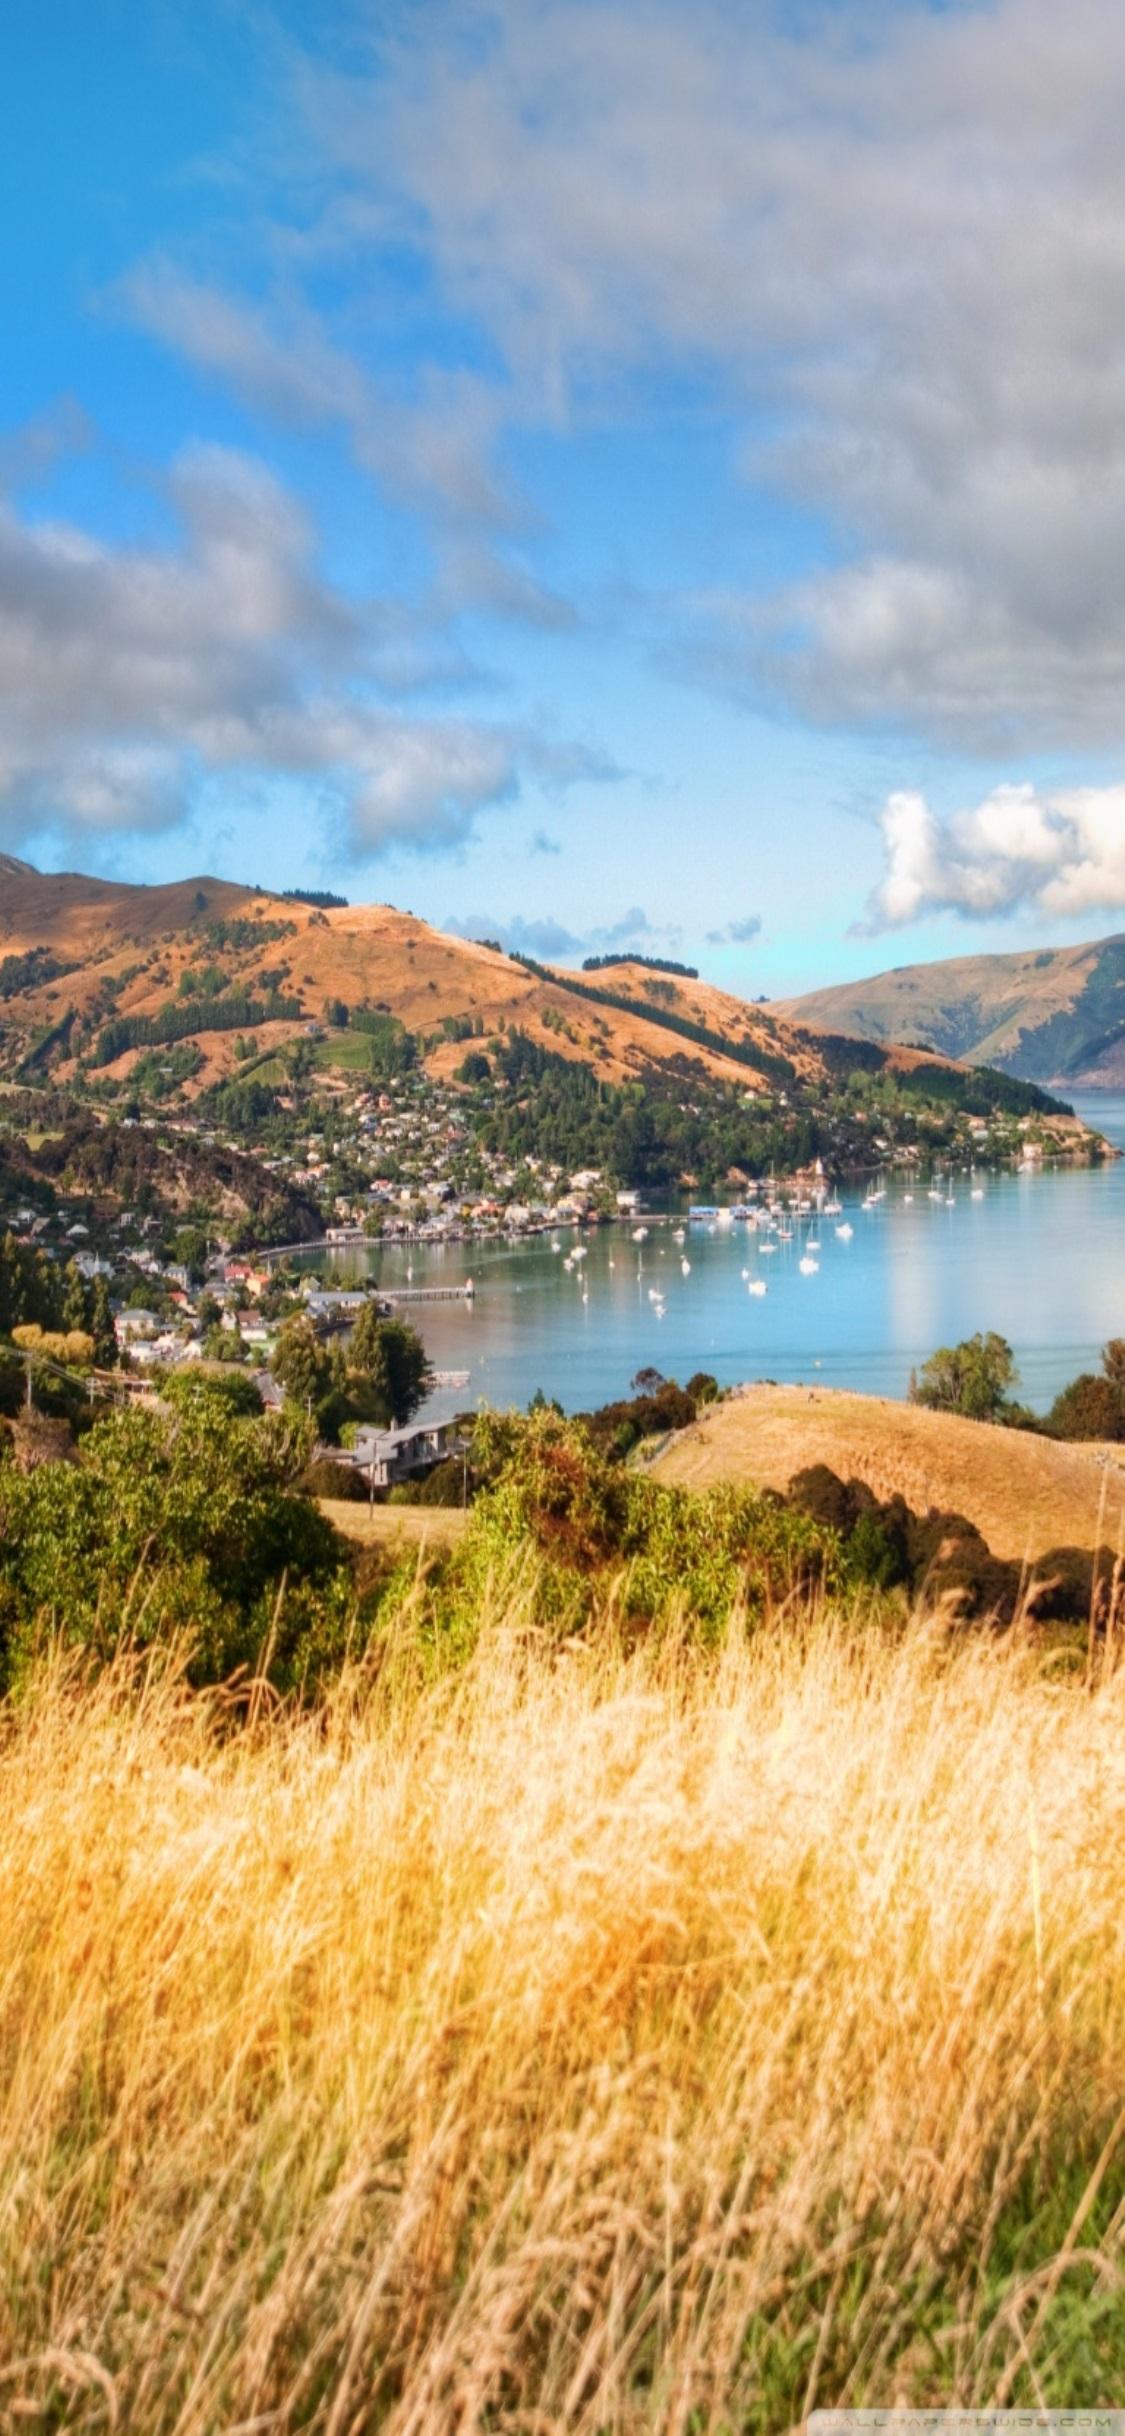 New Zealand Wallpaper For Iphone Akaroa New Zealand - New Zealand Iphone X , HD Wallpaper & Backgrounds